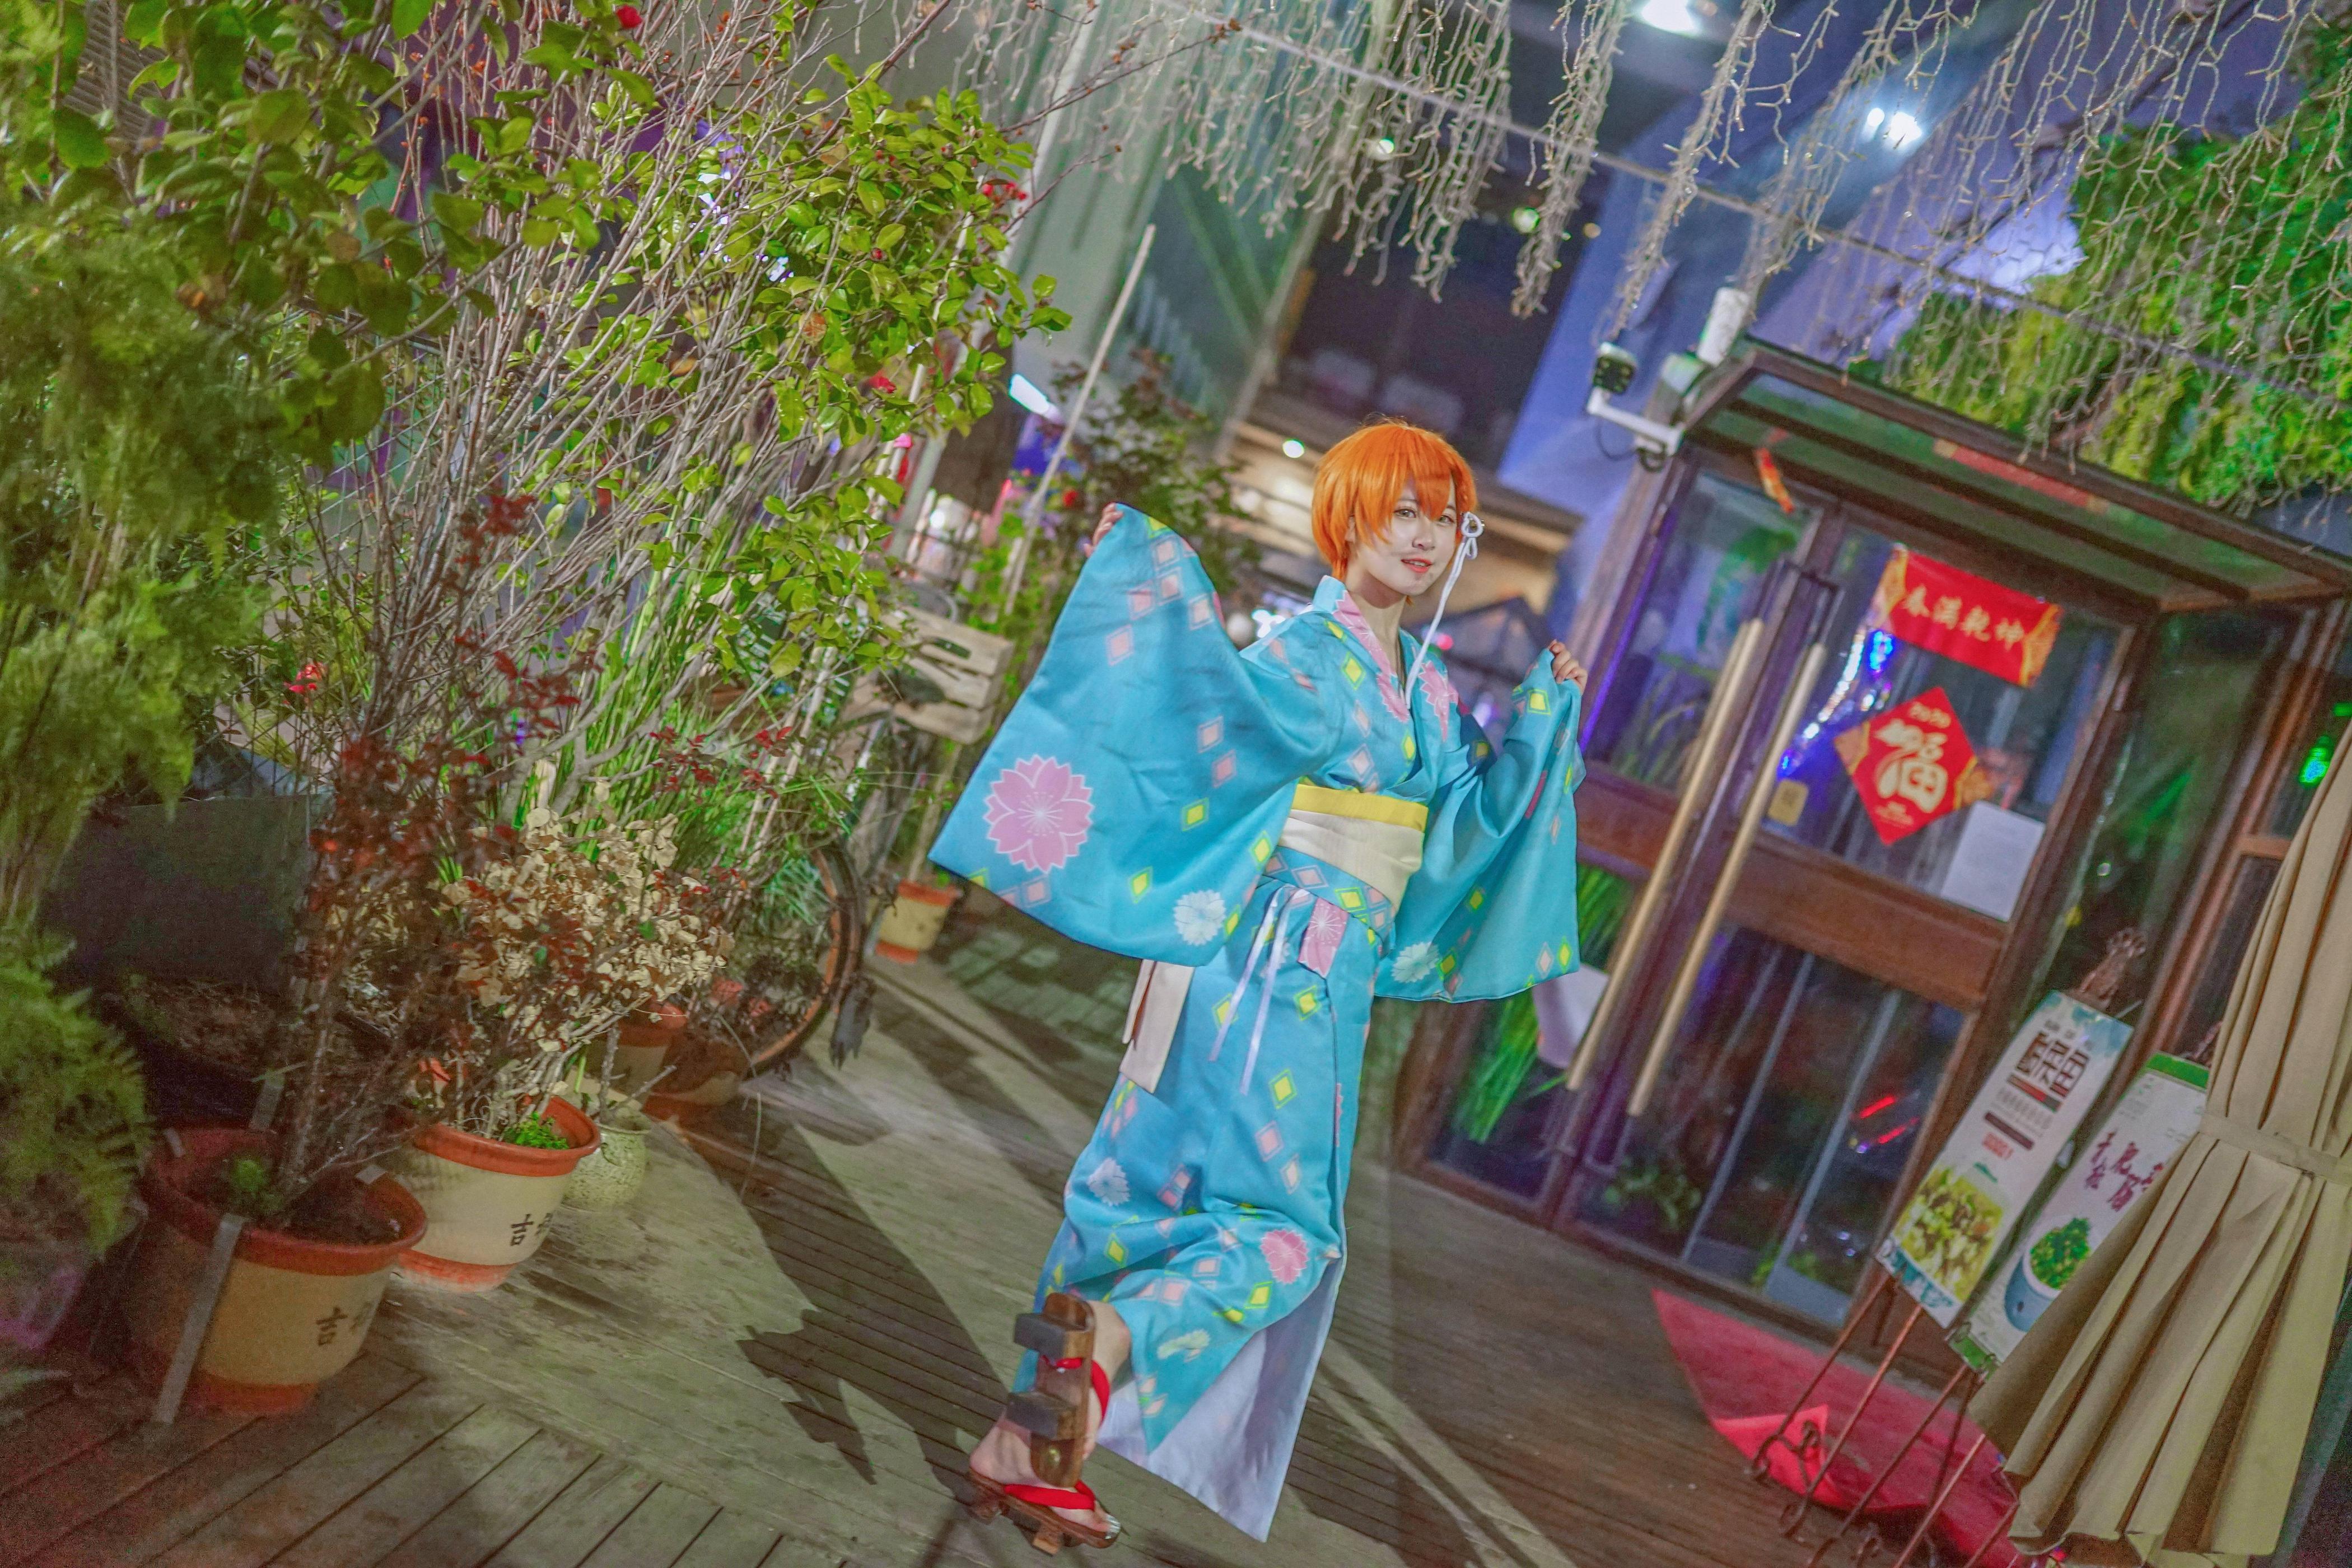 《LOVE LIVE!》萌妹cosplay【CN:_李笑颜Lee】-第7张